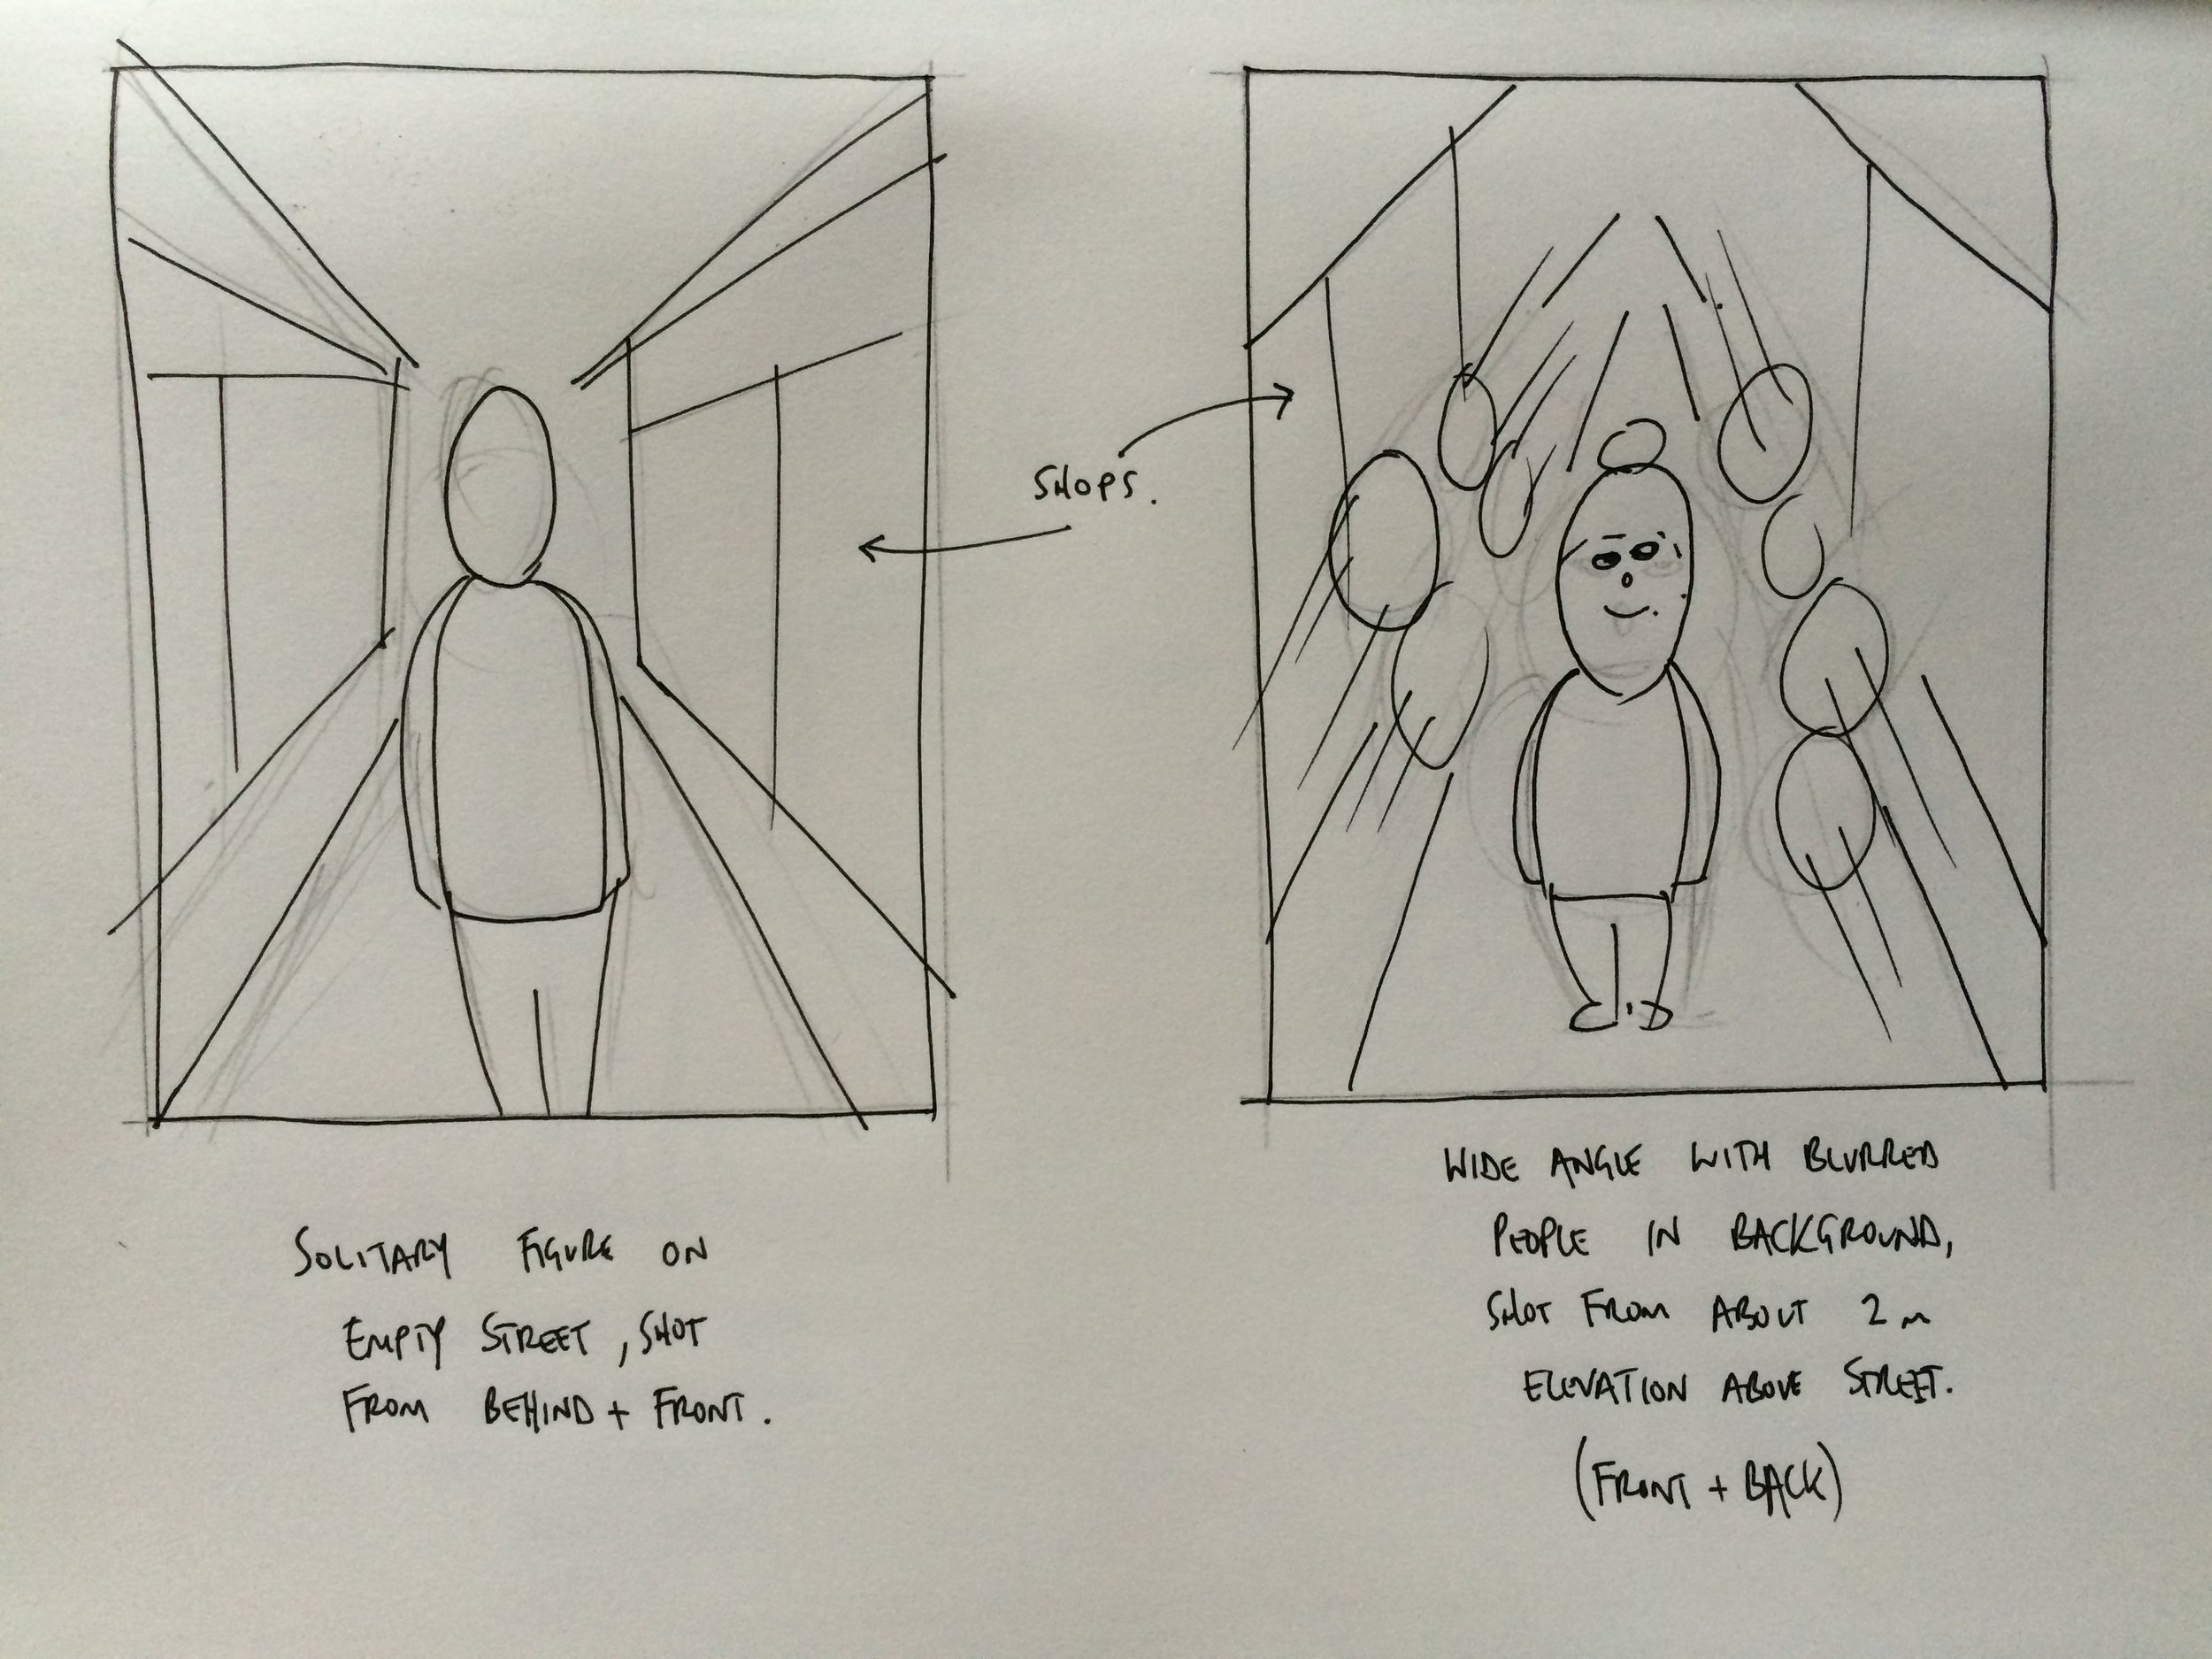 Another Iphigenia in Splott initial scamp sketch